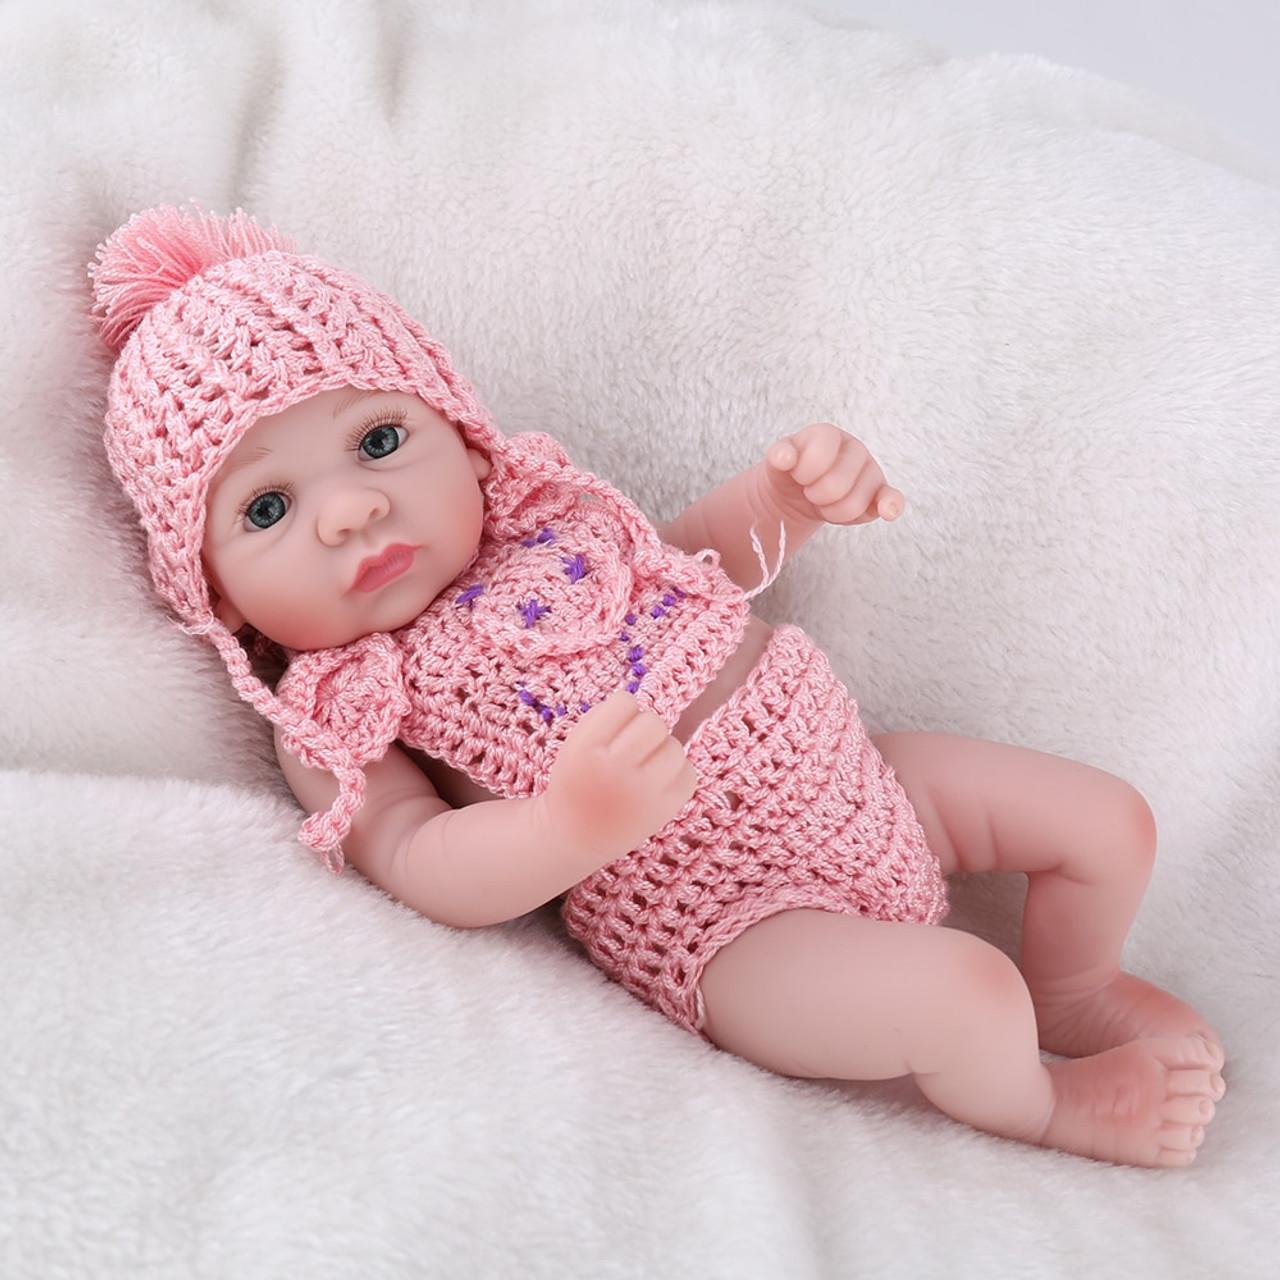 10/'/' REBORN BABY DOLL FULL BODY VINYL SILICONE GIRL NEWBORN TOLLDER TOYS DOLLS